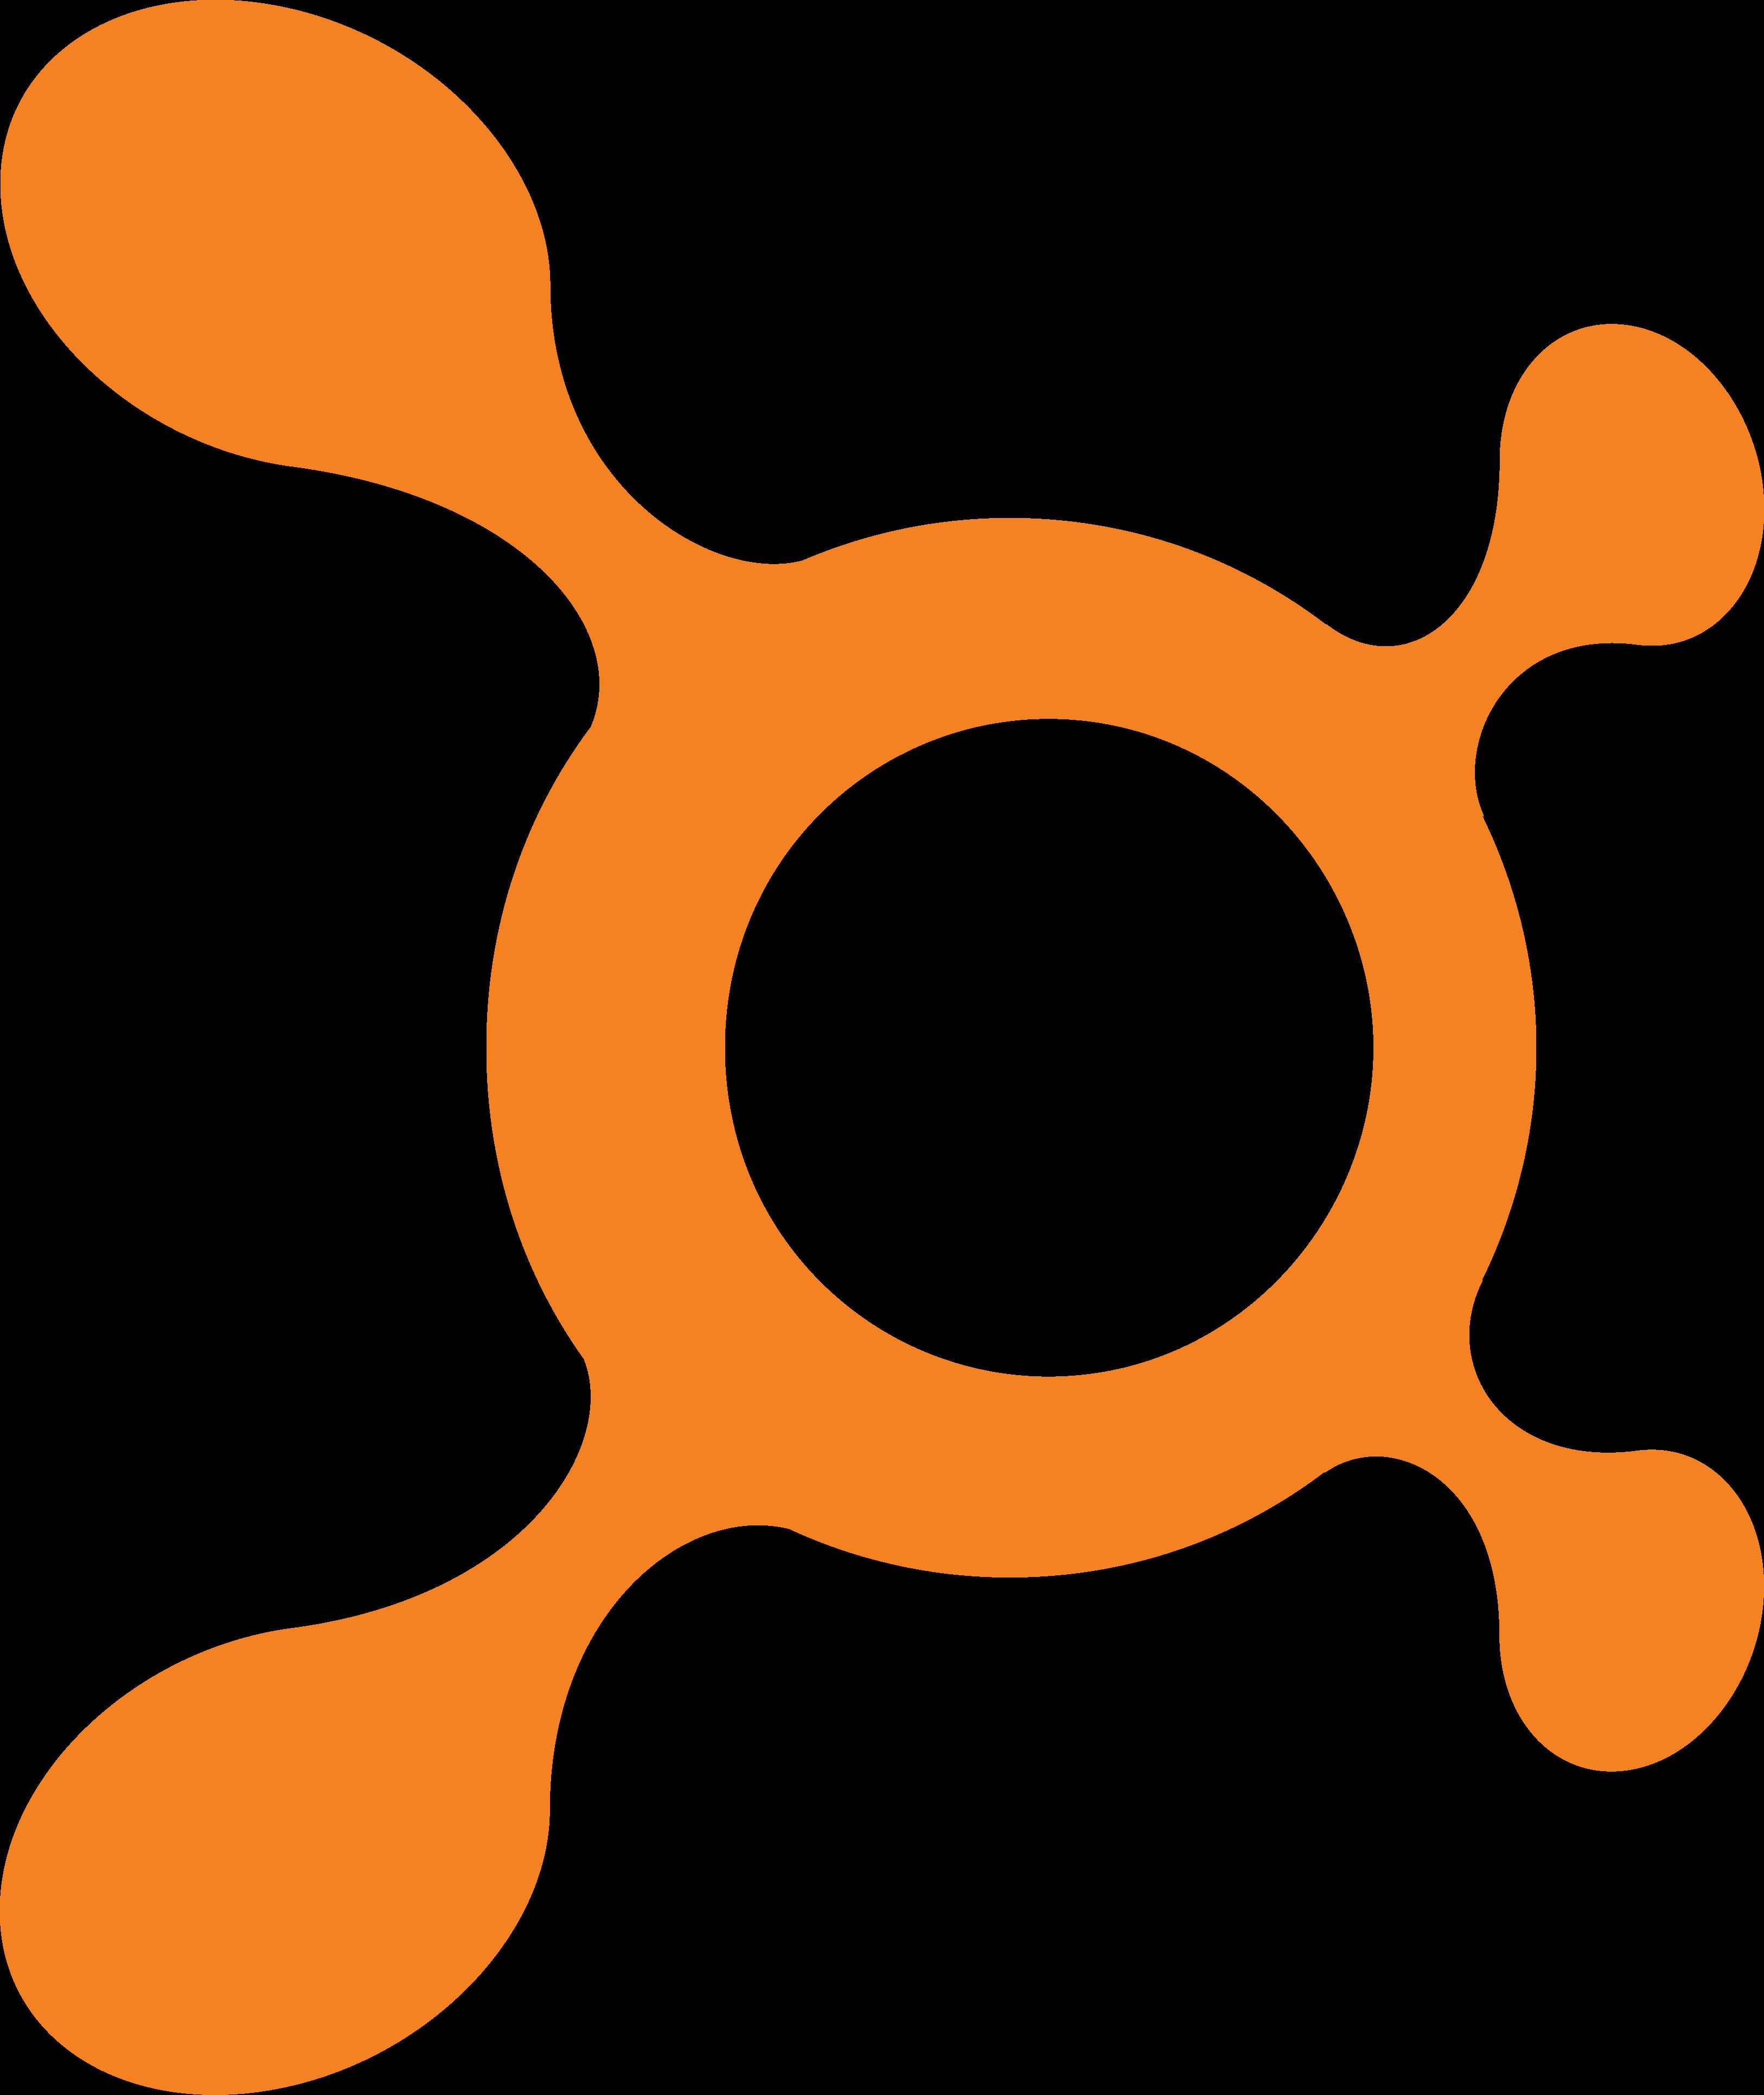 Orangetheoryfitness